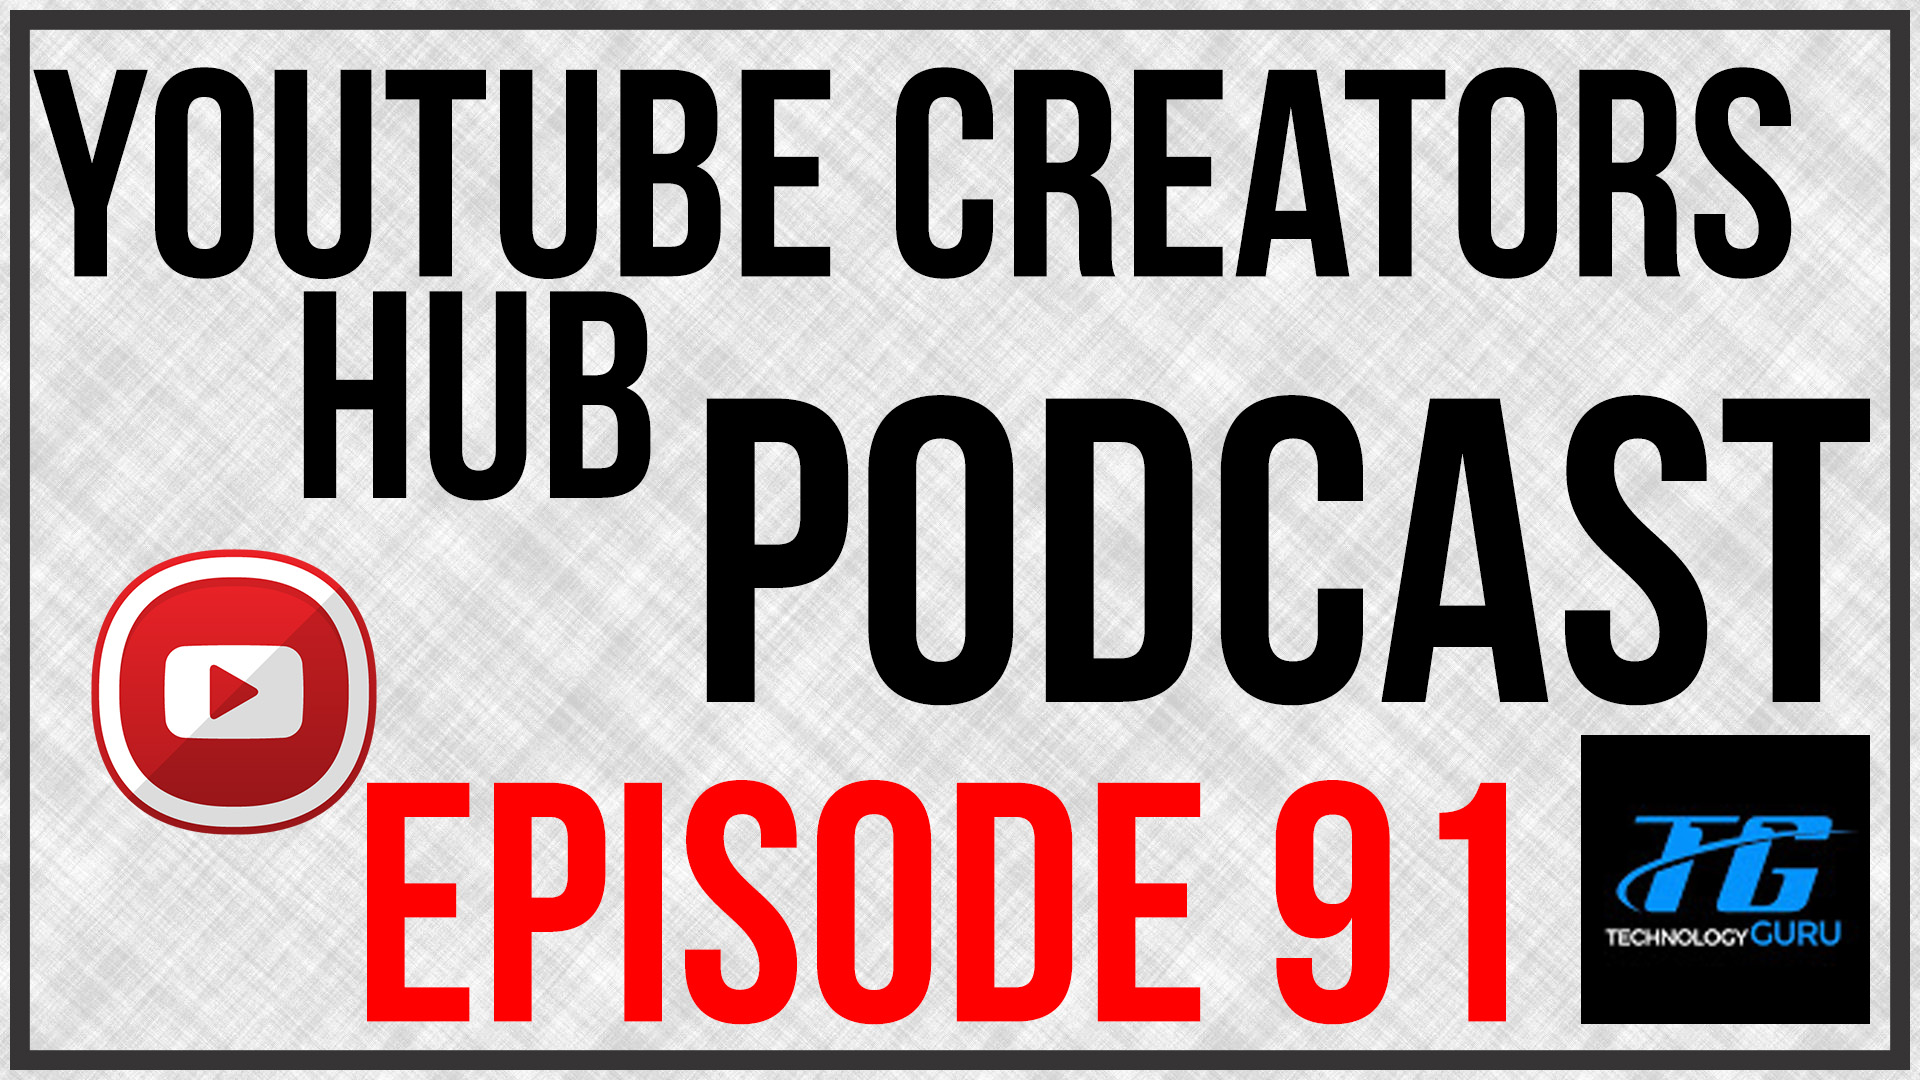 YouTube Creators Hub Podcast Episode 91